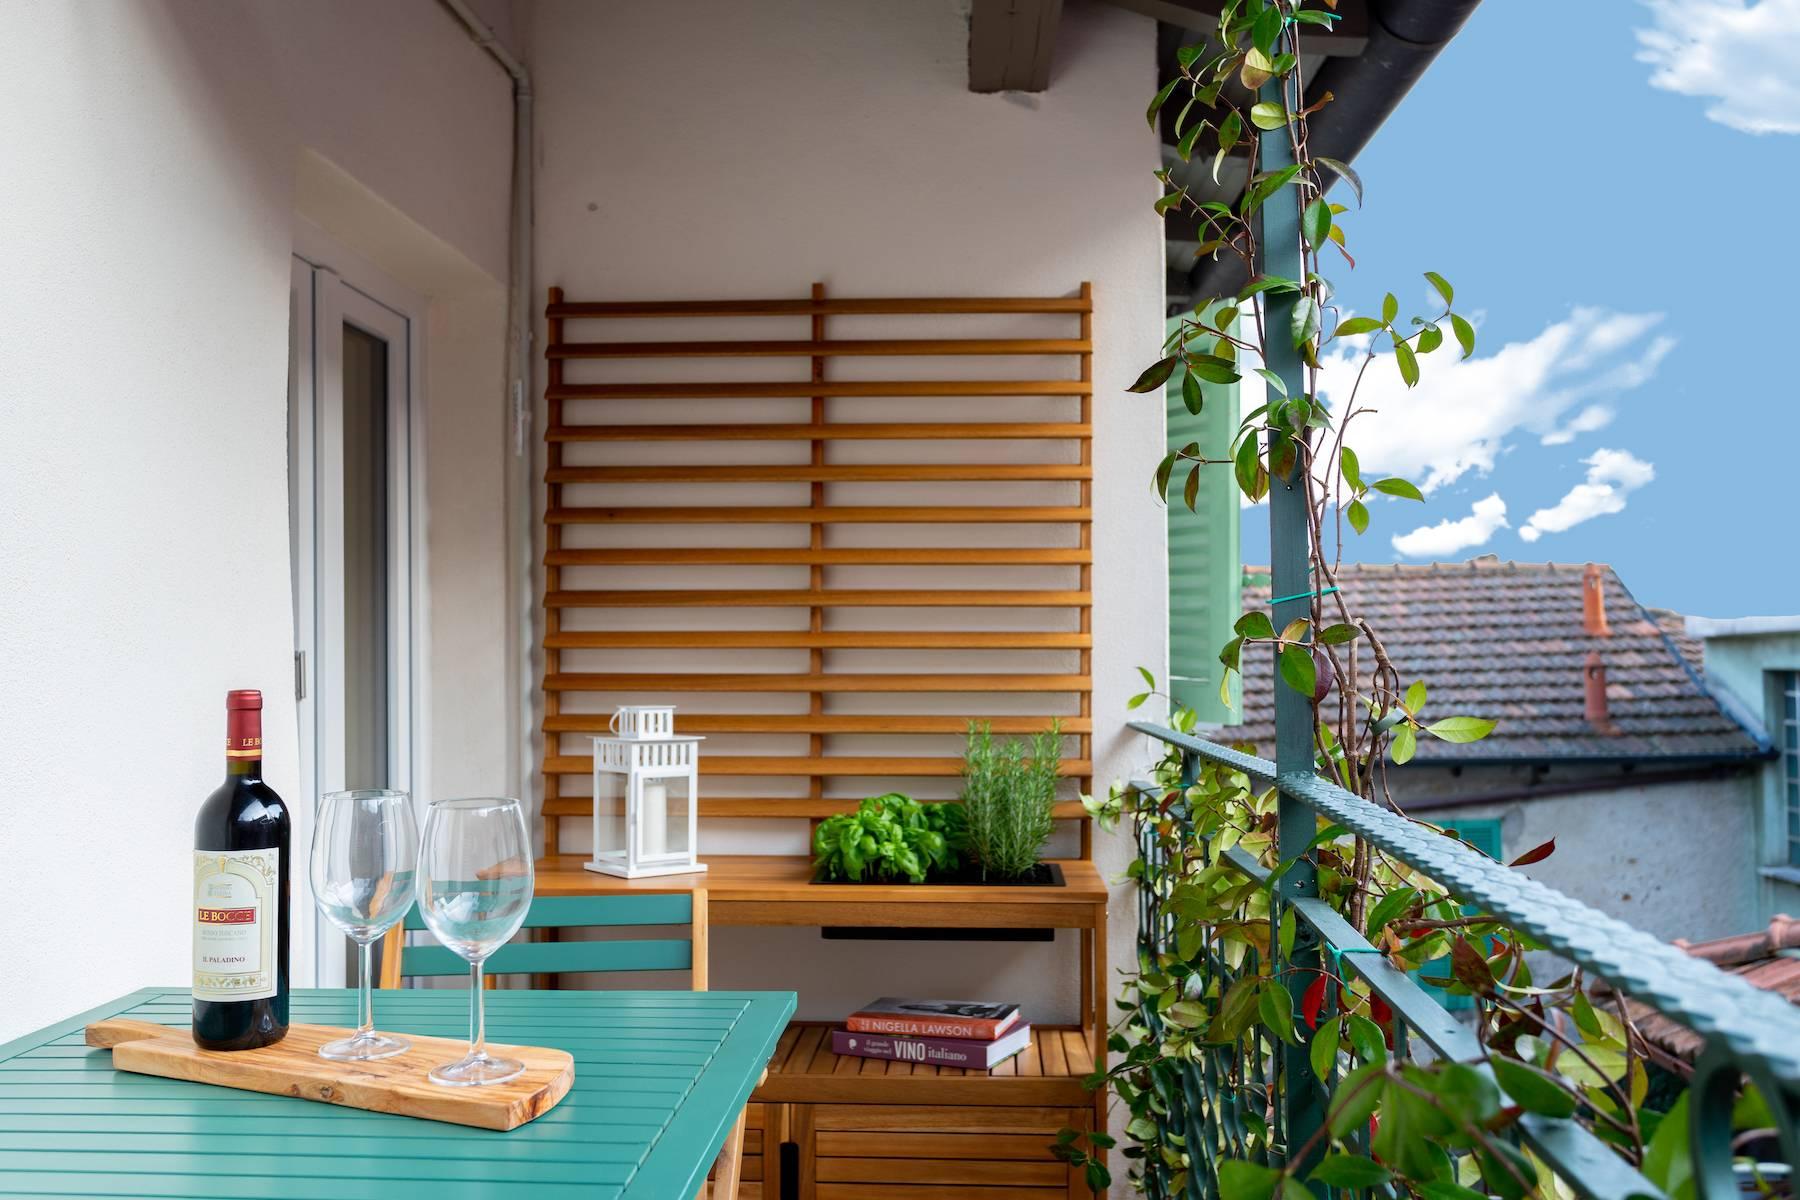 Appartamento in Vendita a Belgirate: 3 locali, 62 mq - Foto 1